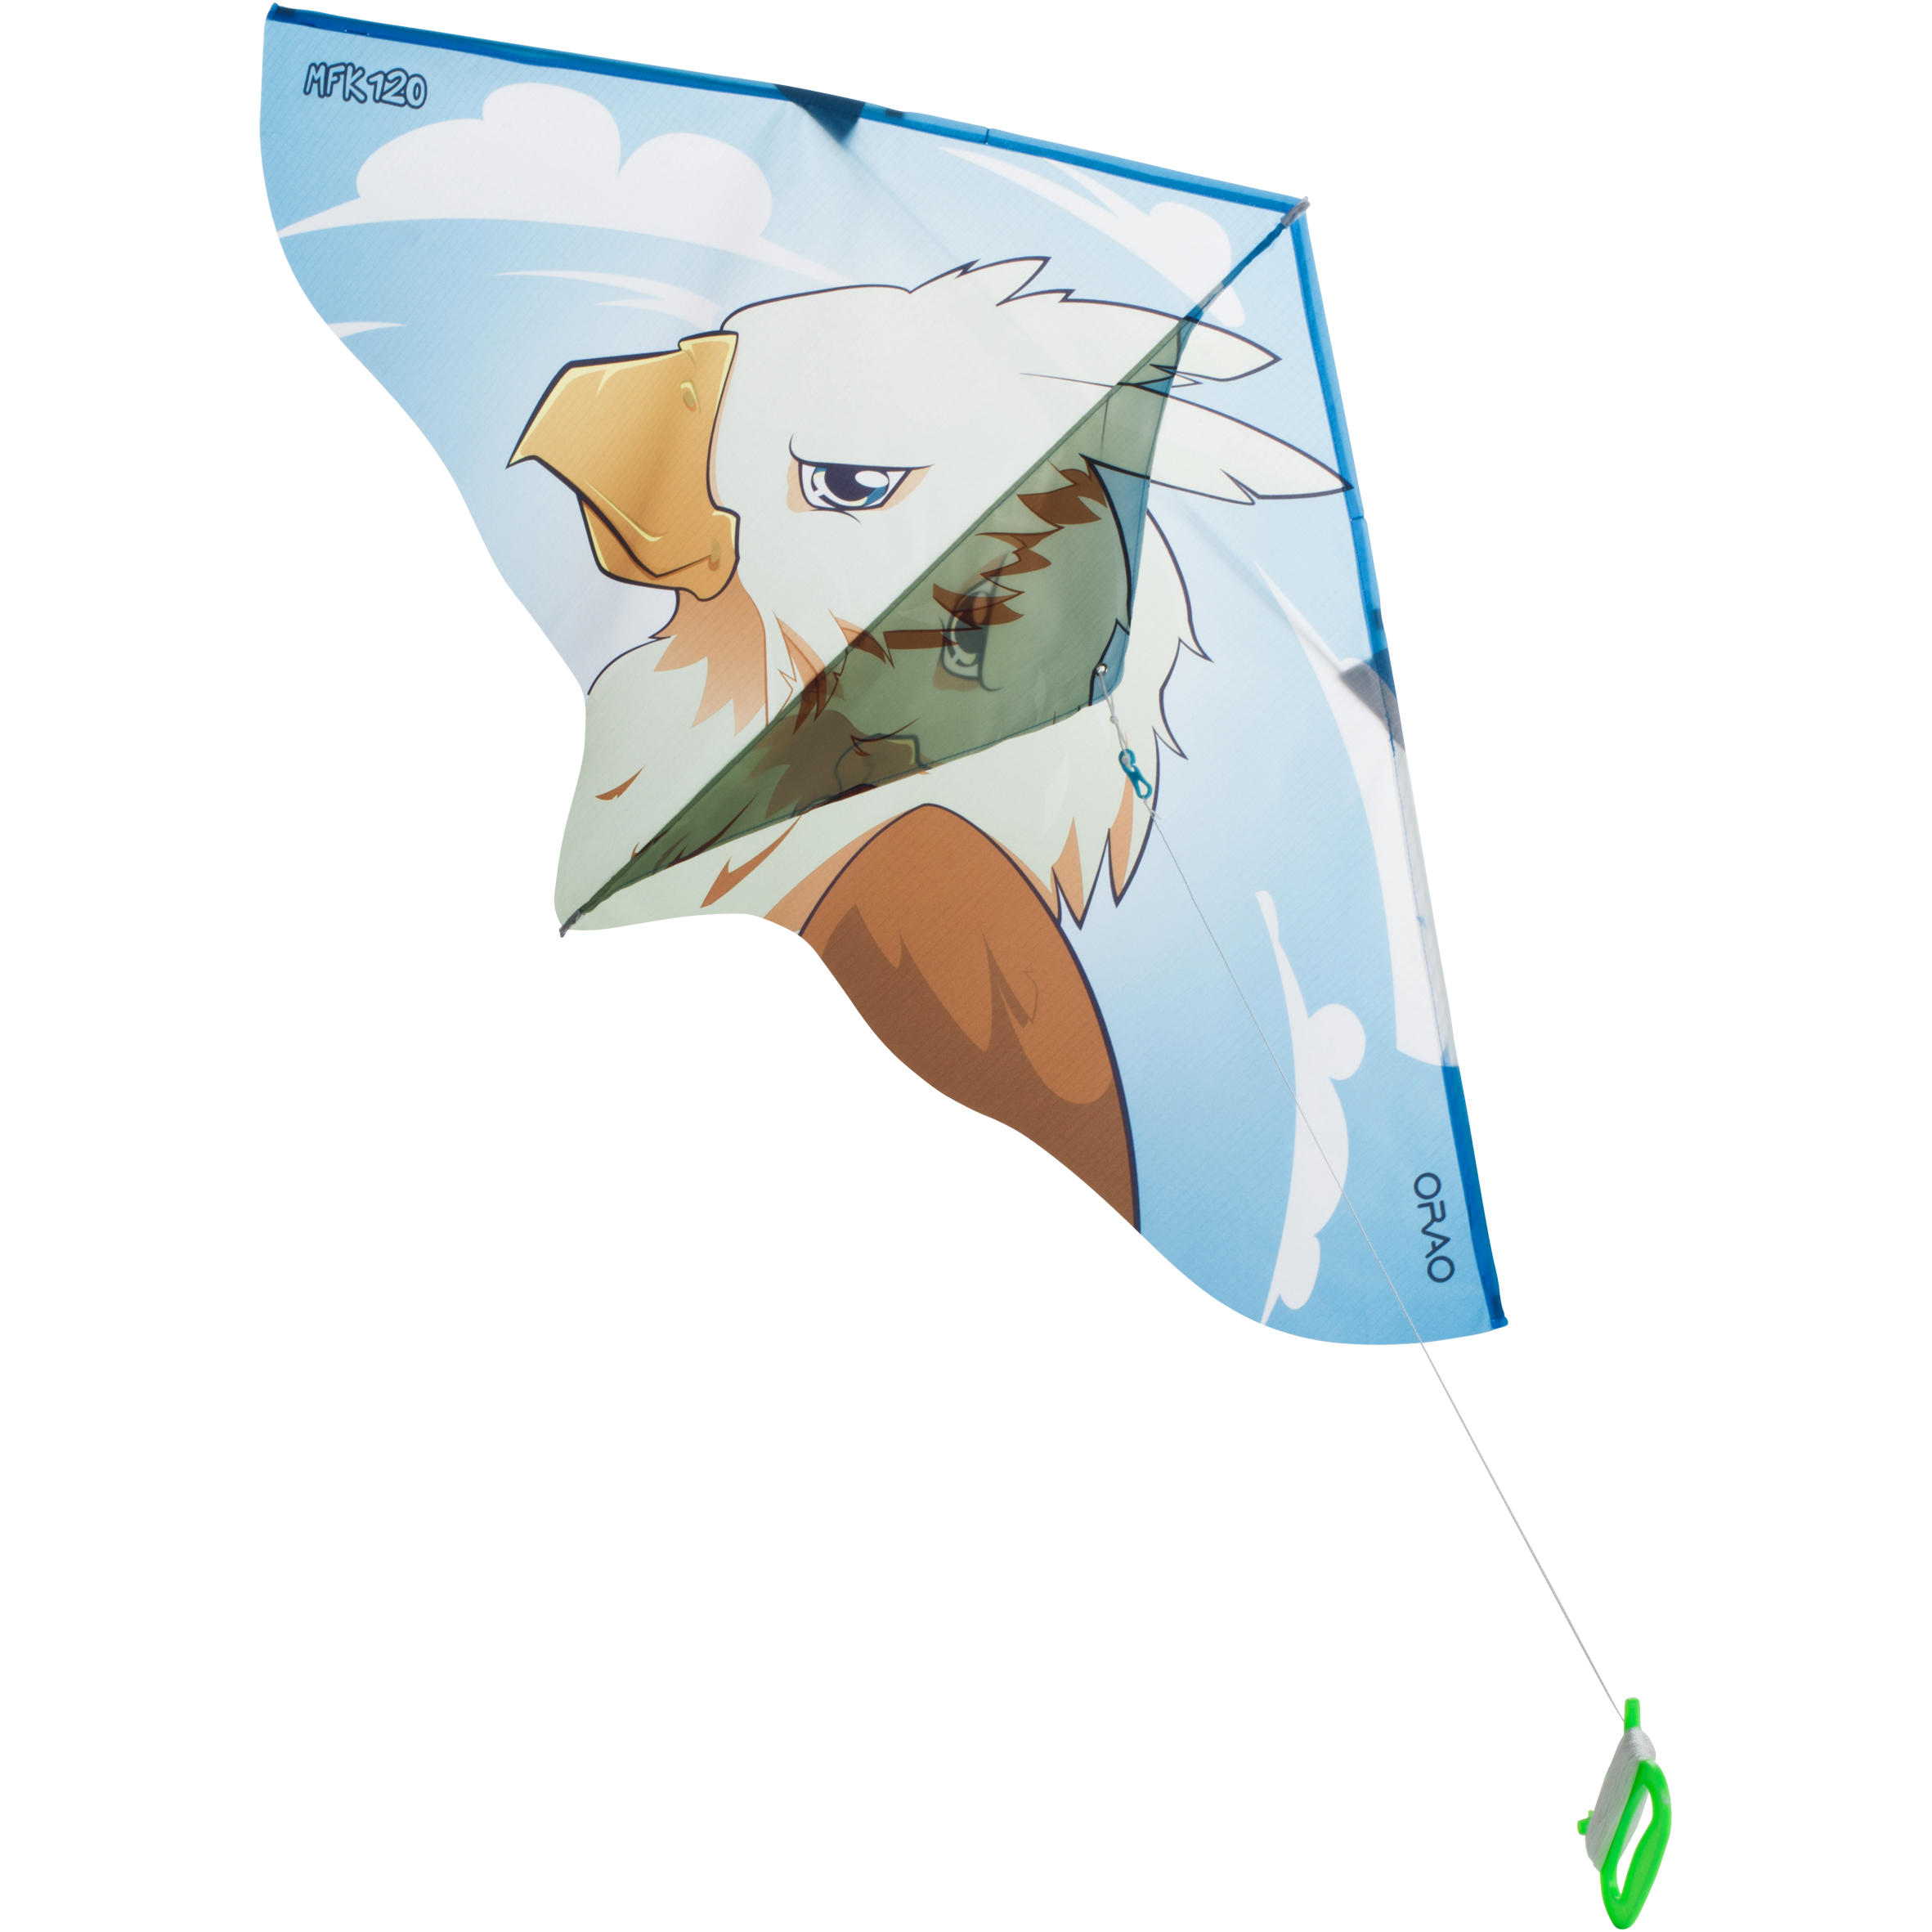 MFK 120 Static Kite - Eagle